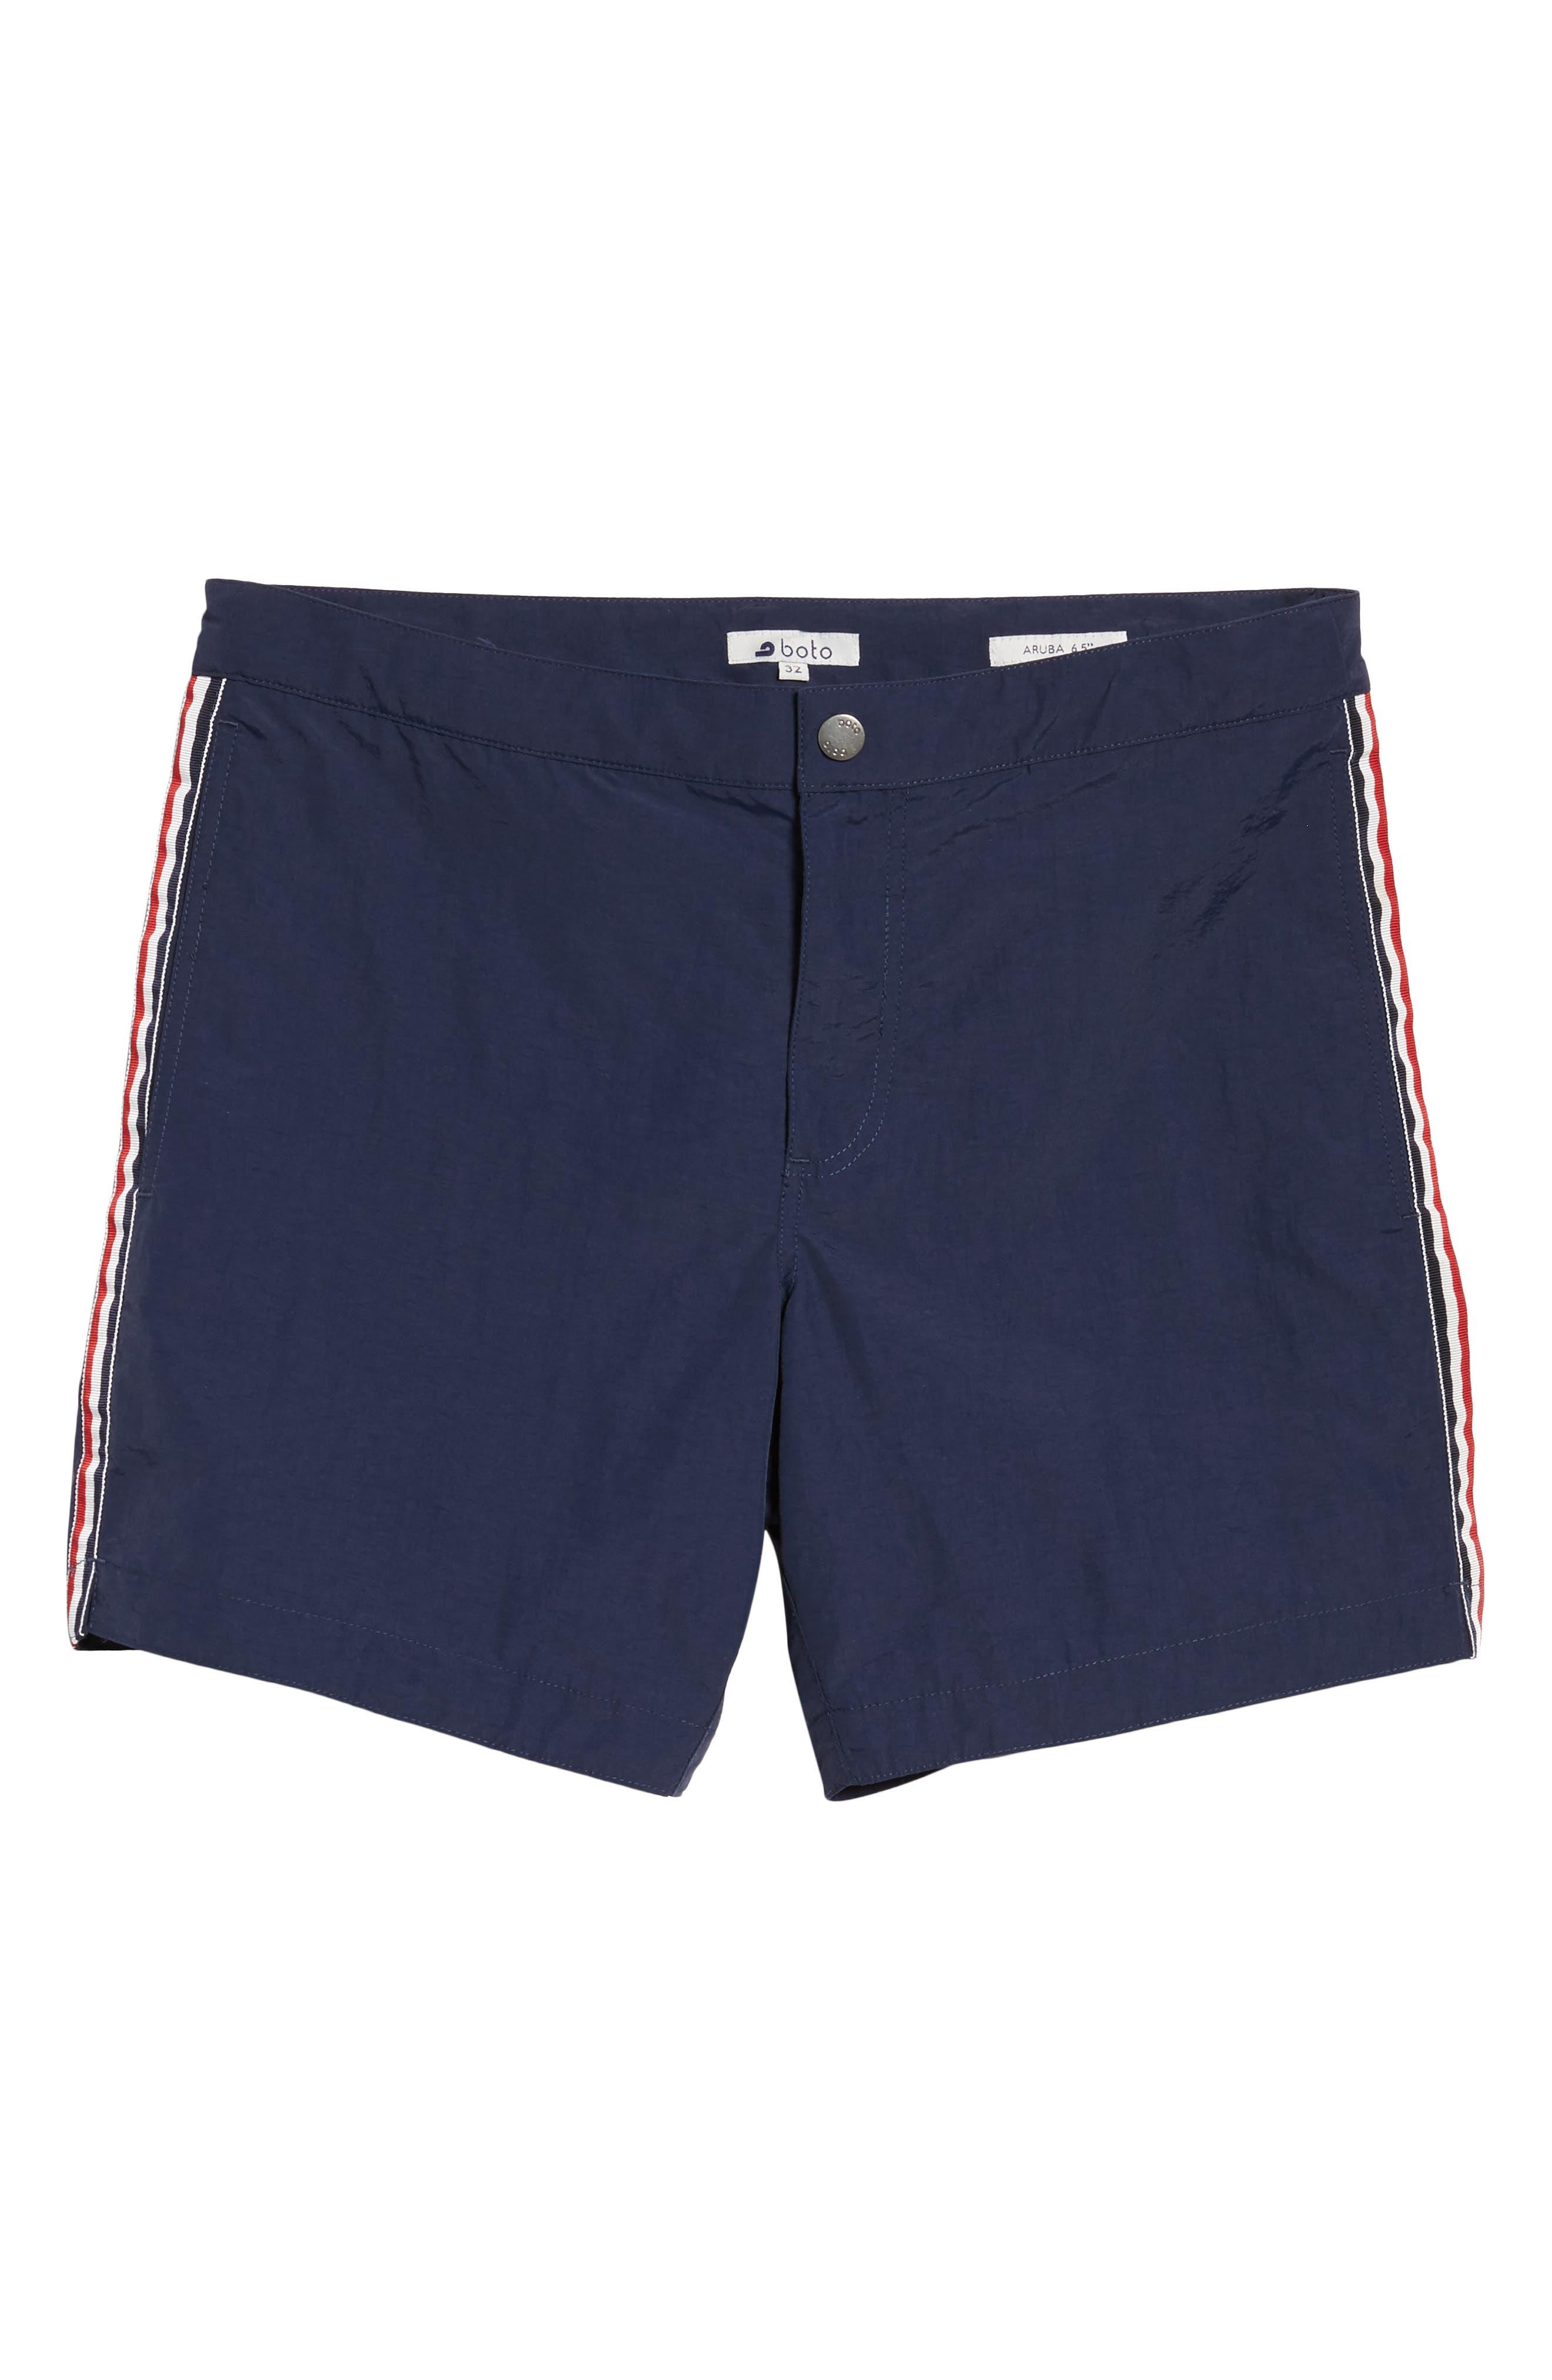 Aruba Tailored Fit French Stripe Swim Trunks,                             Alternate thumbnail 12, color,